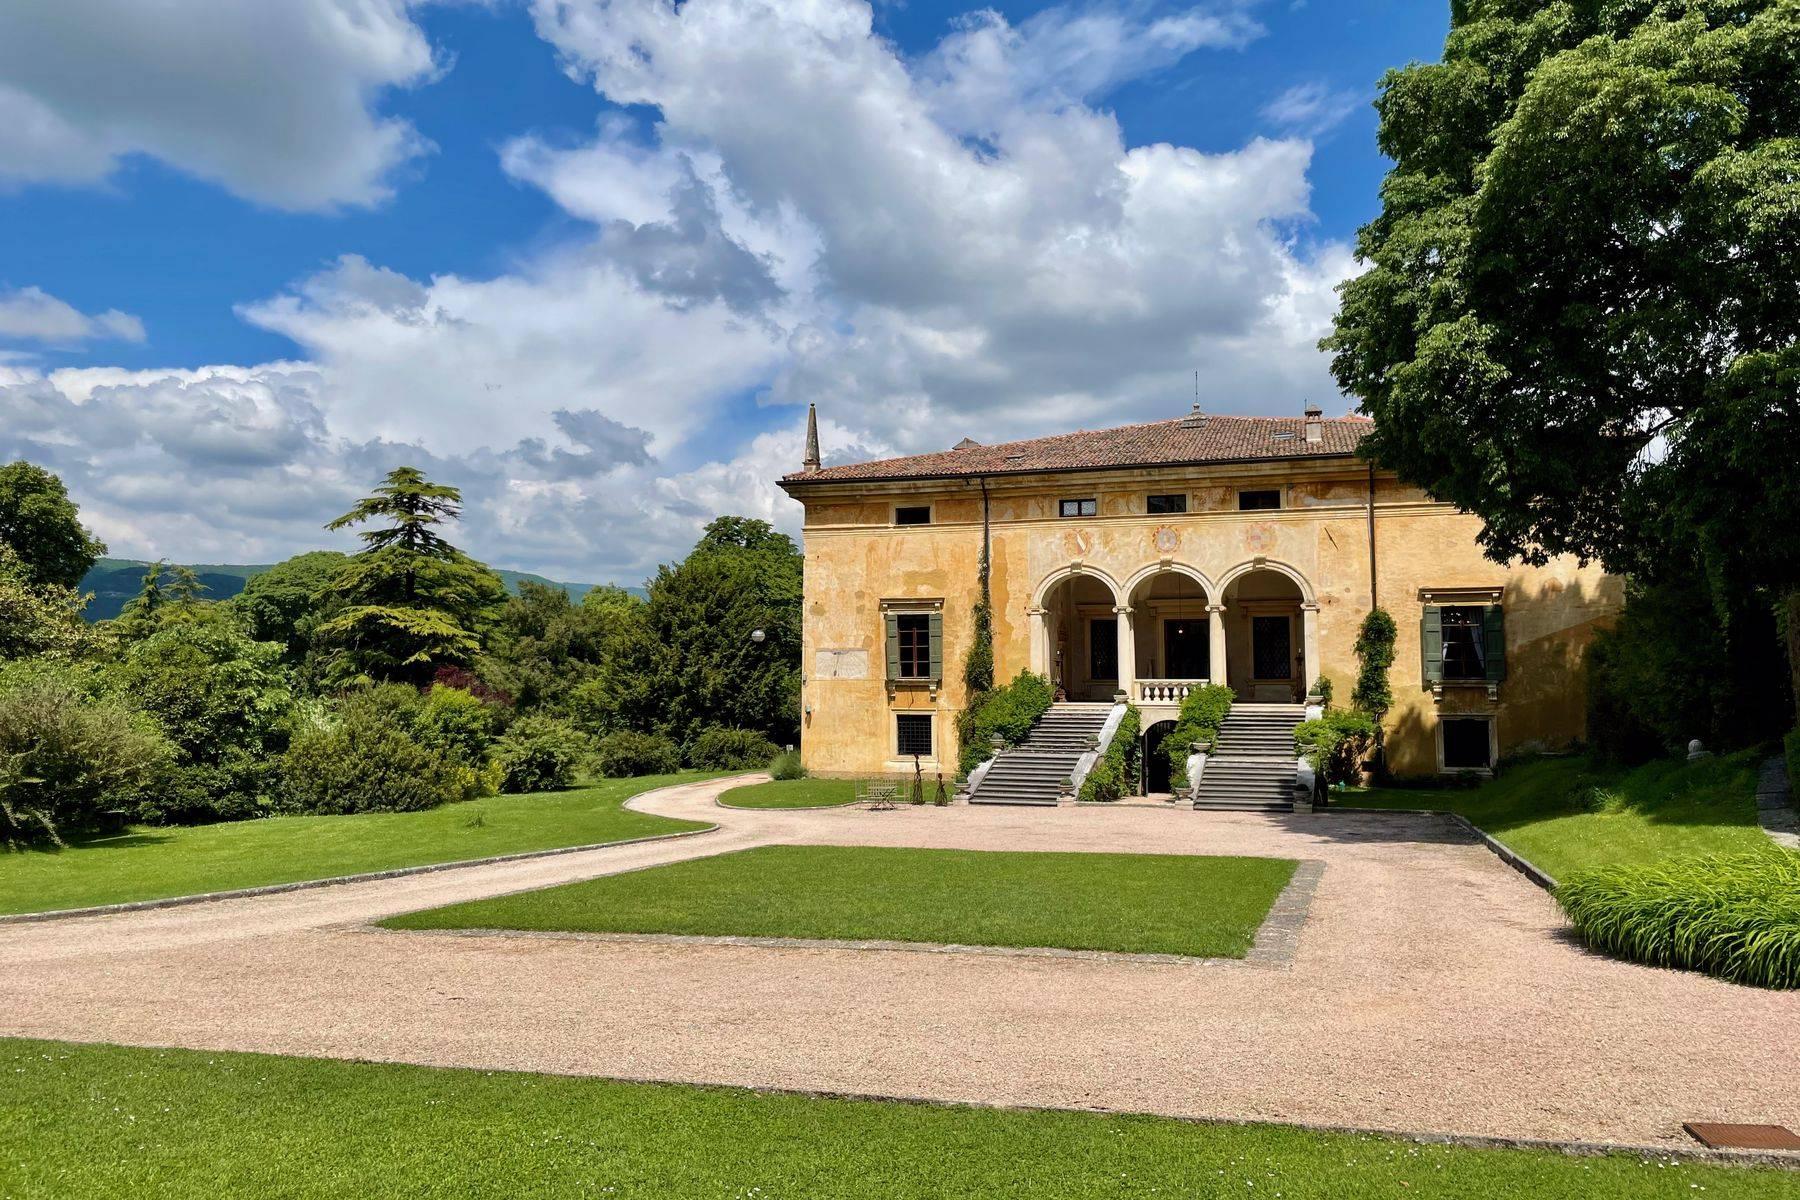 Villa in Vendita a Verona: 5 locali, 2400 mq - Foto 30